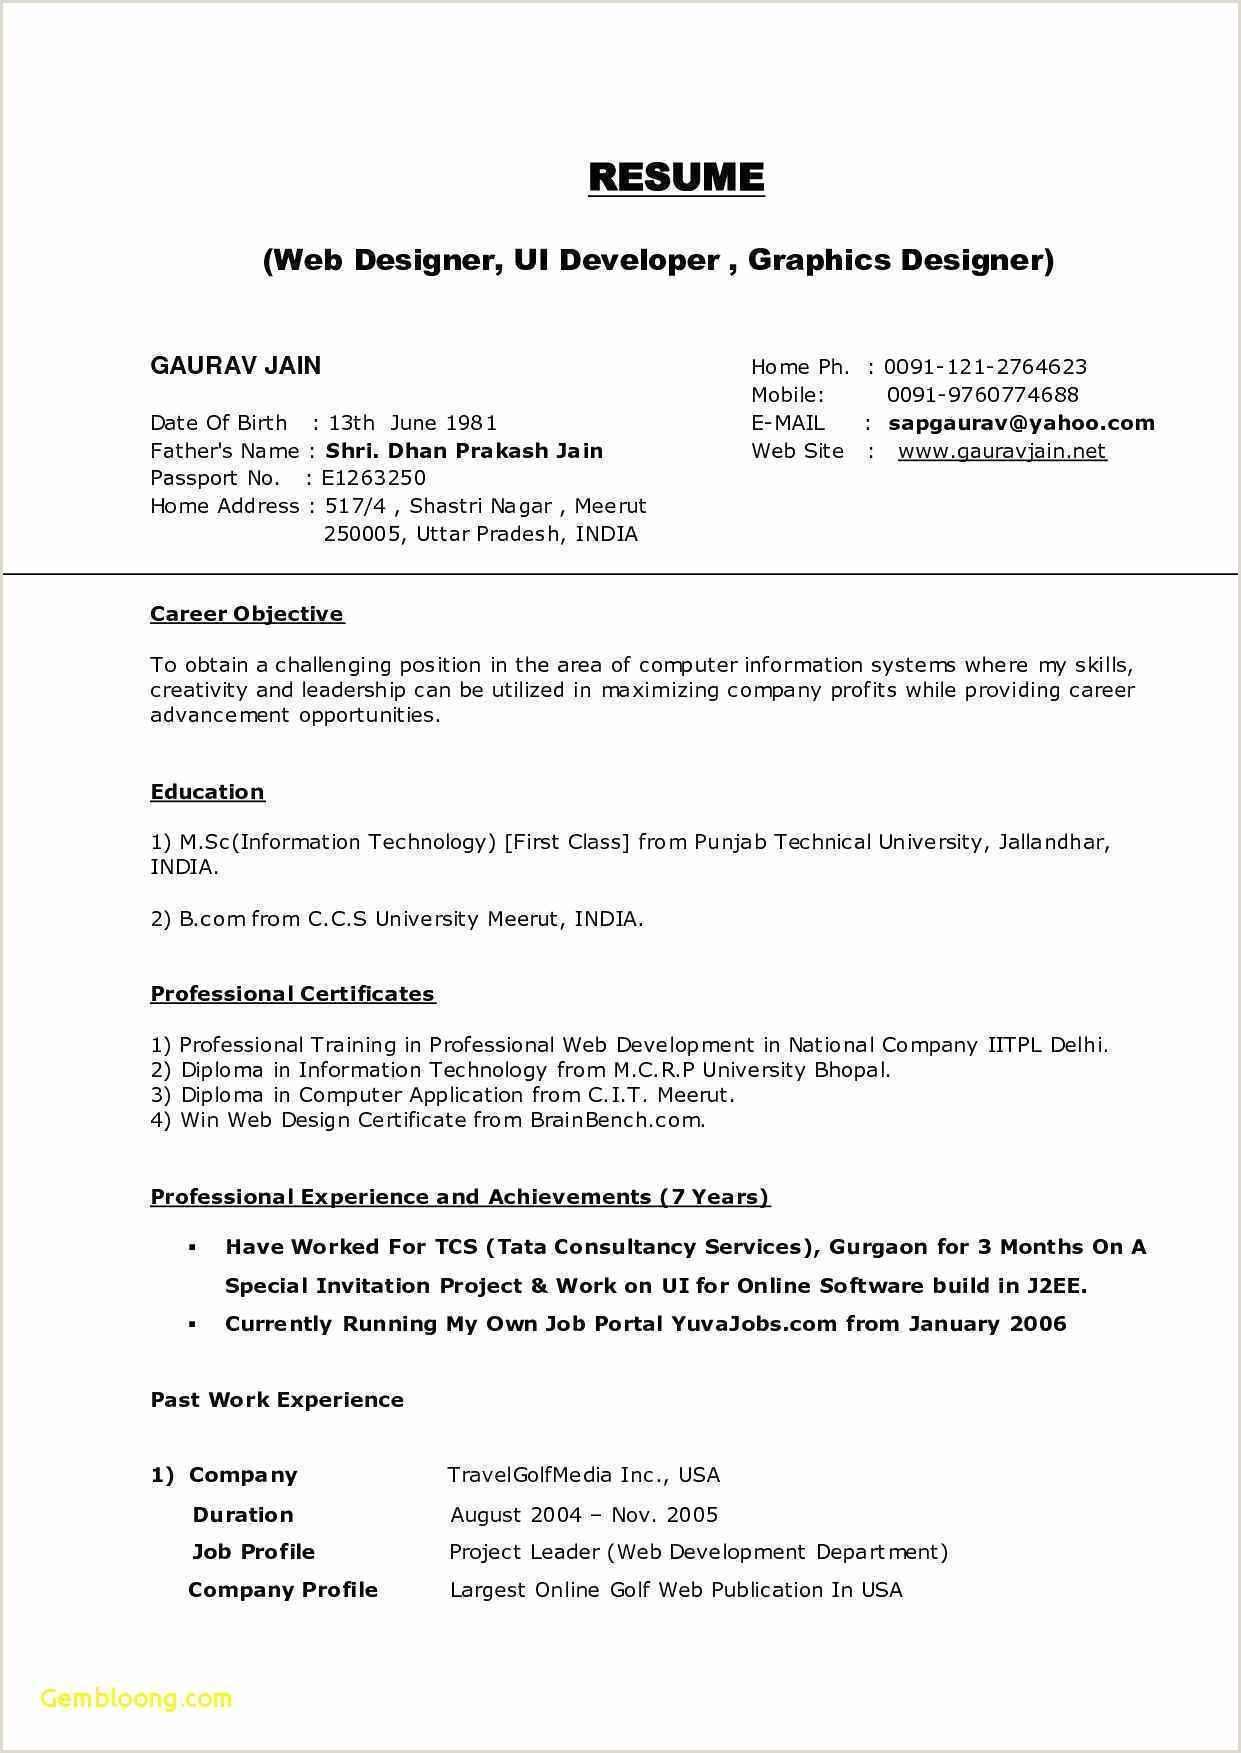 Fresher Bcom Resume Format Doc In